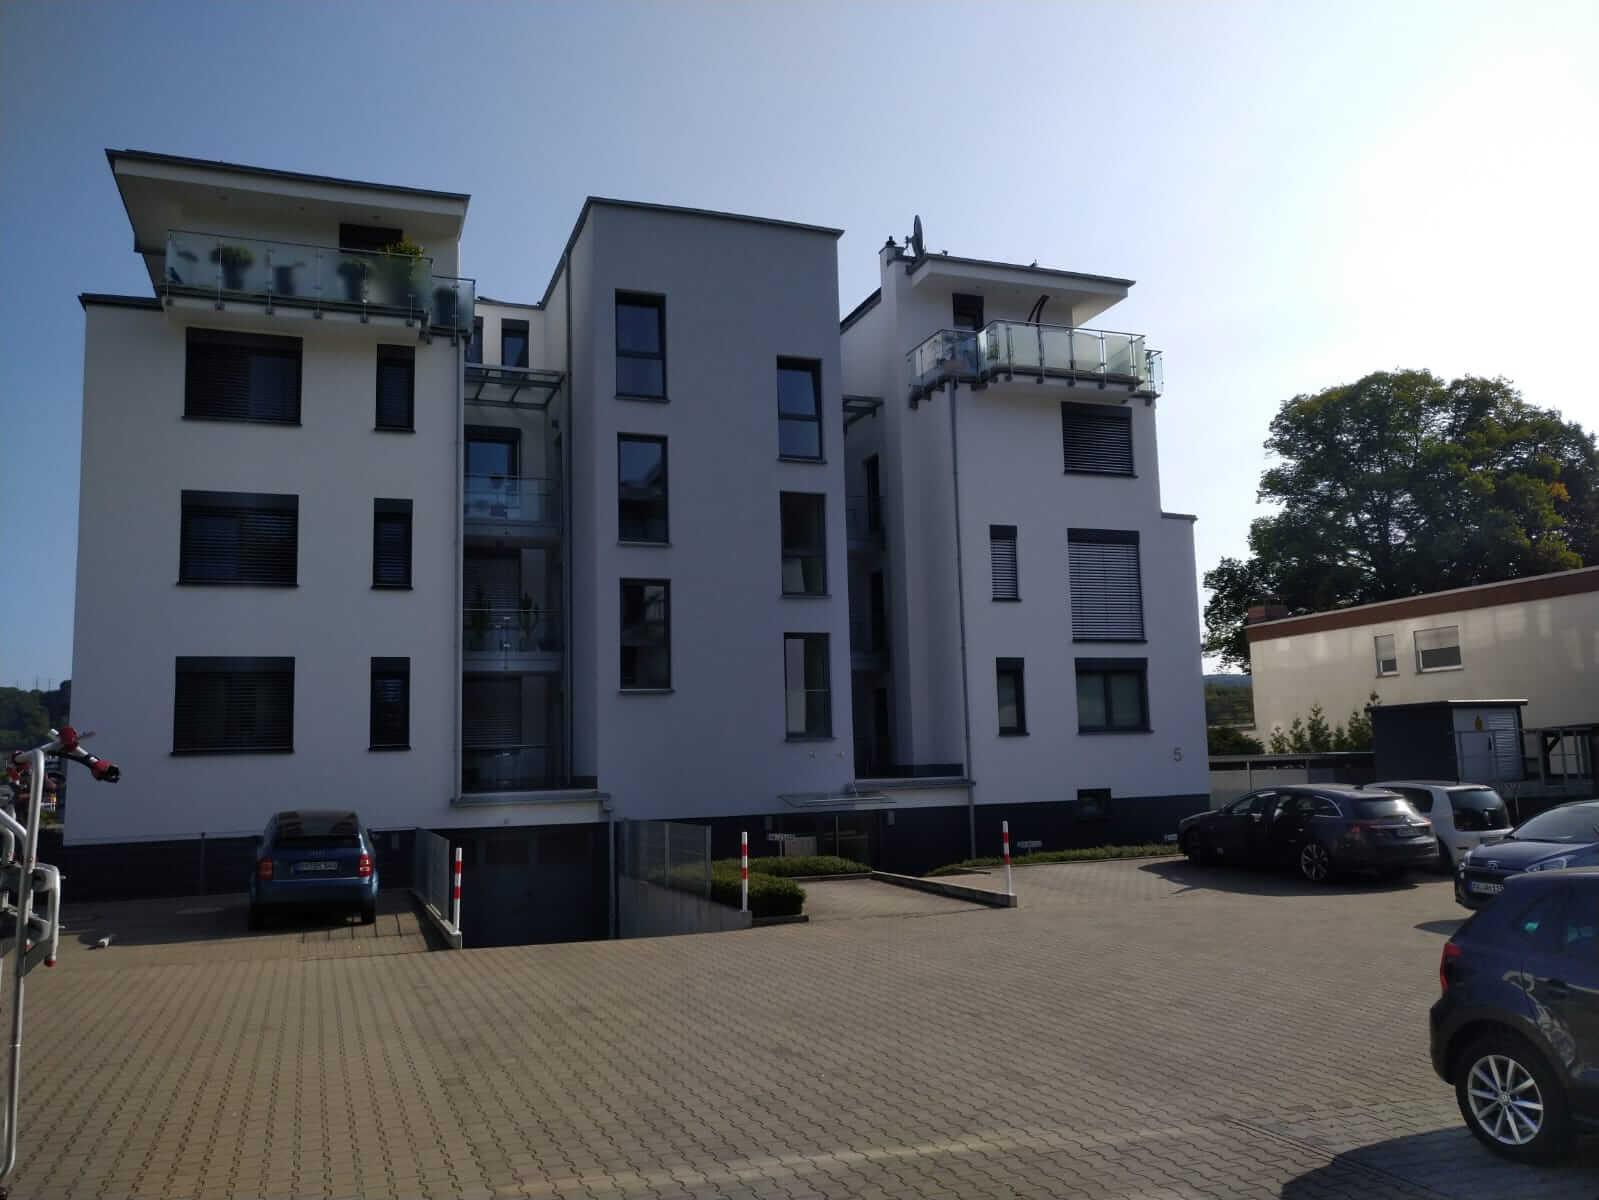 Mehrfamilienwohnhaus – Tempelgasse 5, Bad Breisig